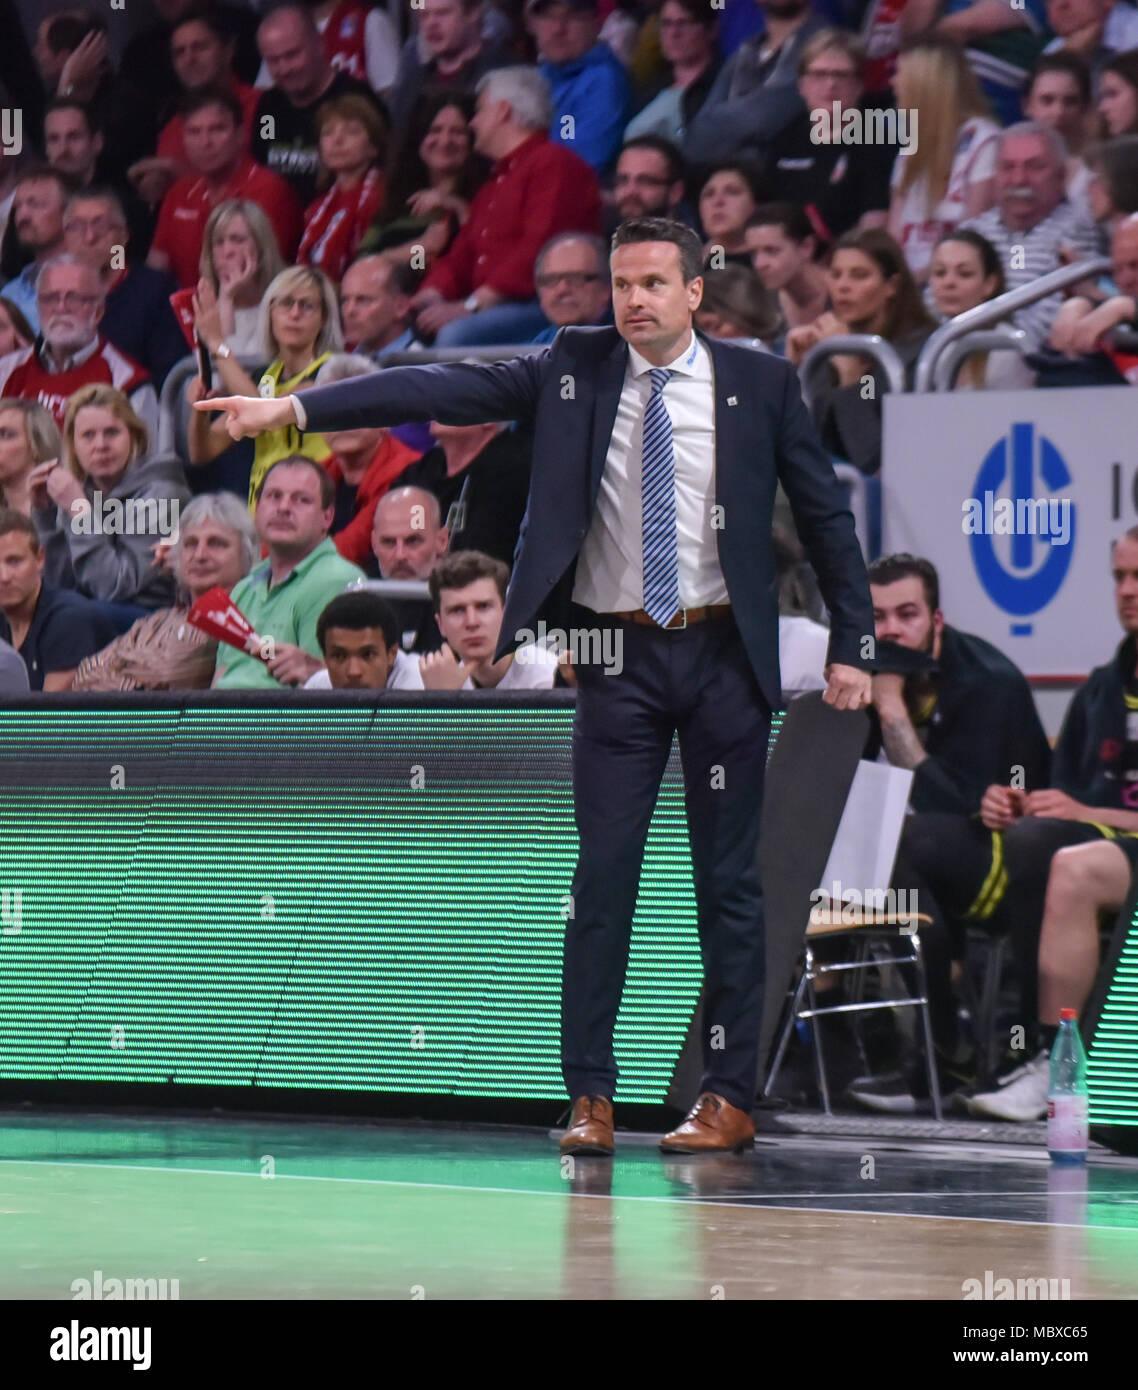 Deutschland, Bamberg, Brose Arena - 11. April 2018 - Basketball, 1. Bundesliga, BBL-Brose Bamberg vs. Medi Bayreuth - Bild: Raoul Korner (Medi Bayreuth, Head Coach) Foto: Ryan Evans Stockbild